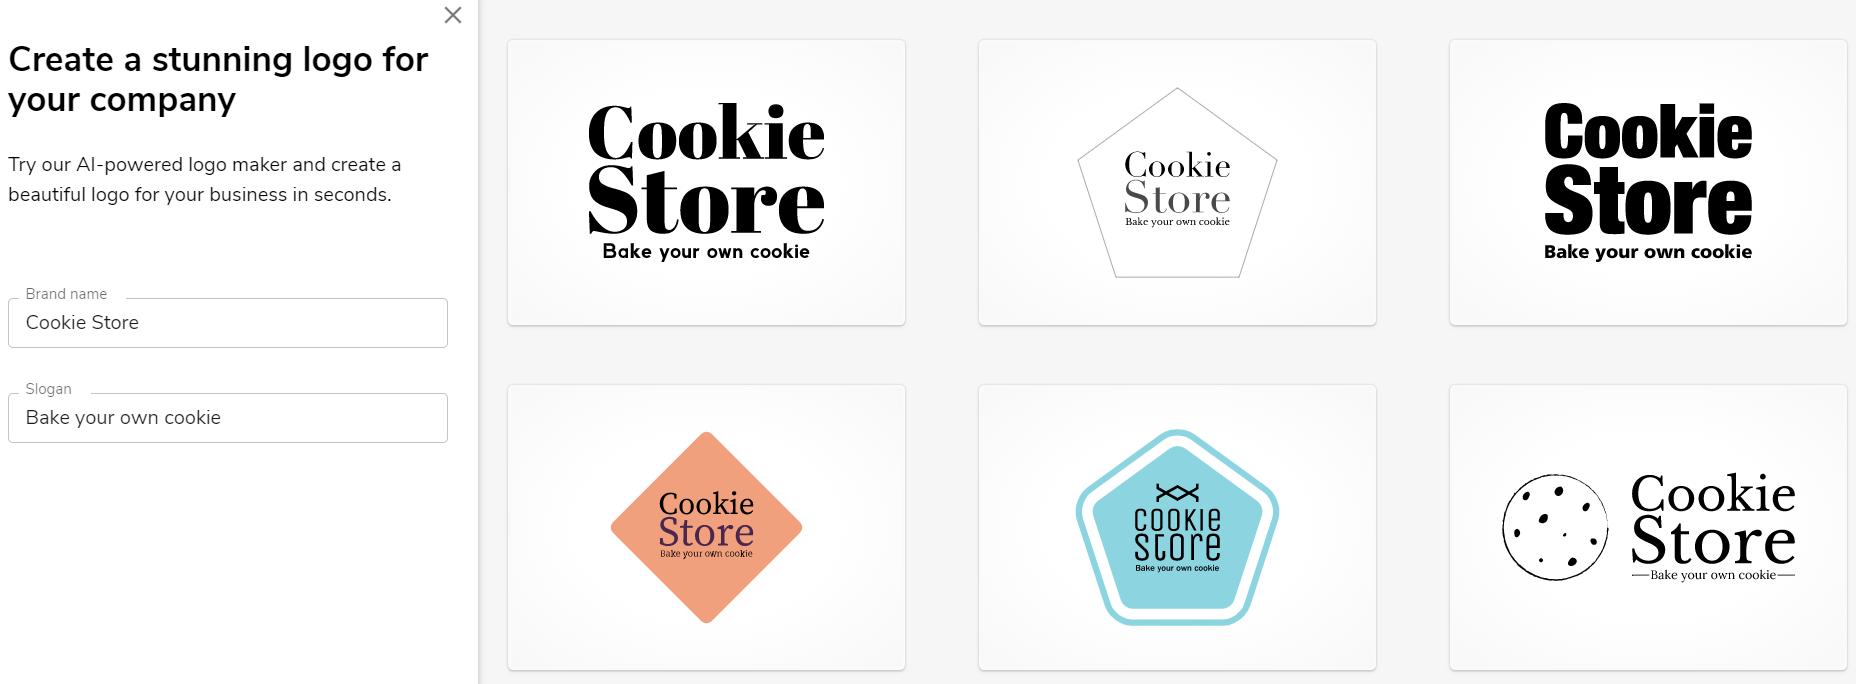 Creador de logotipos gratuito, creador de logotipos de contacto constante